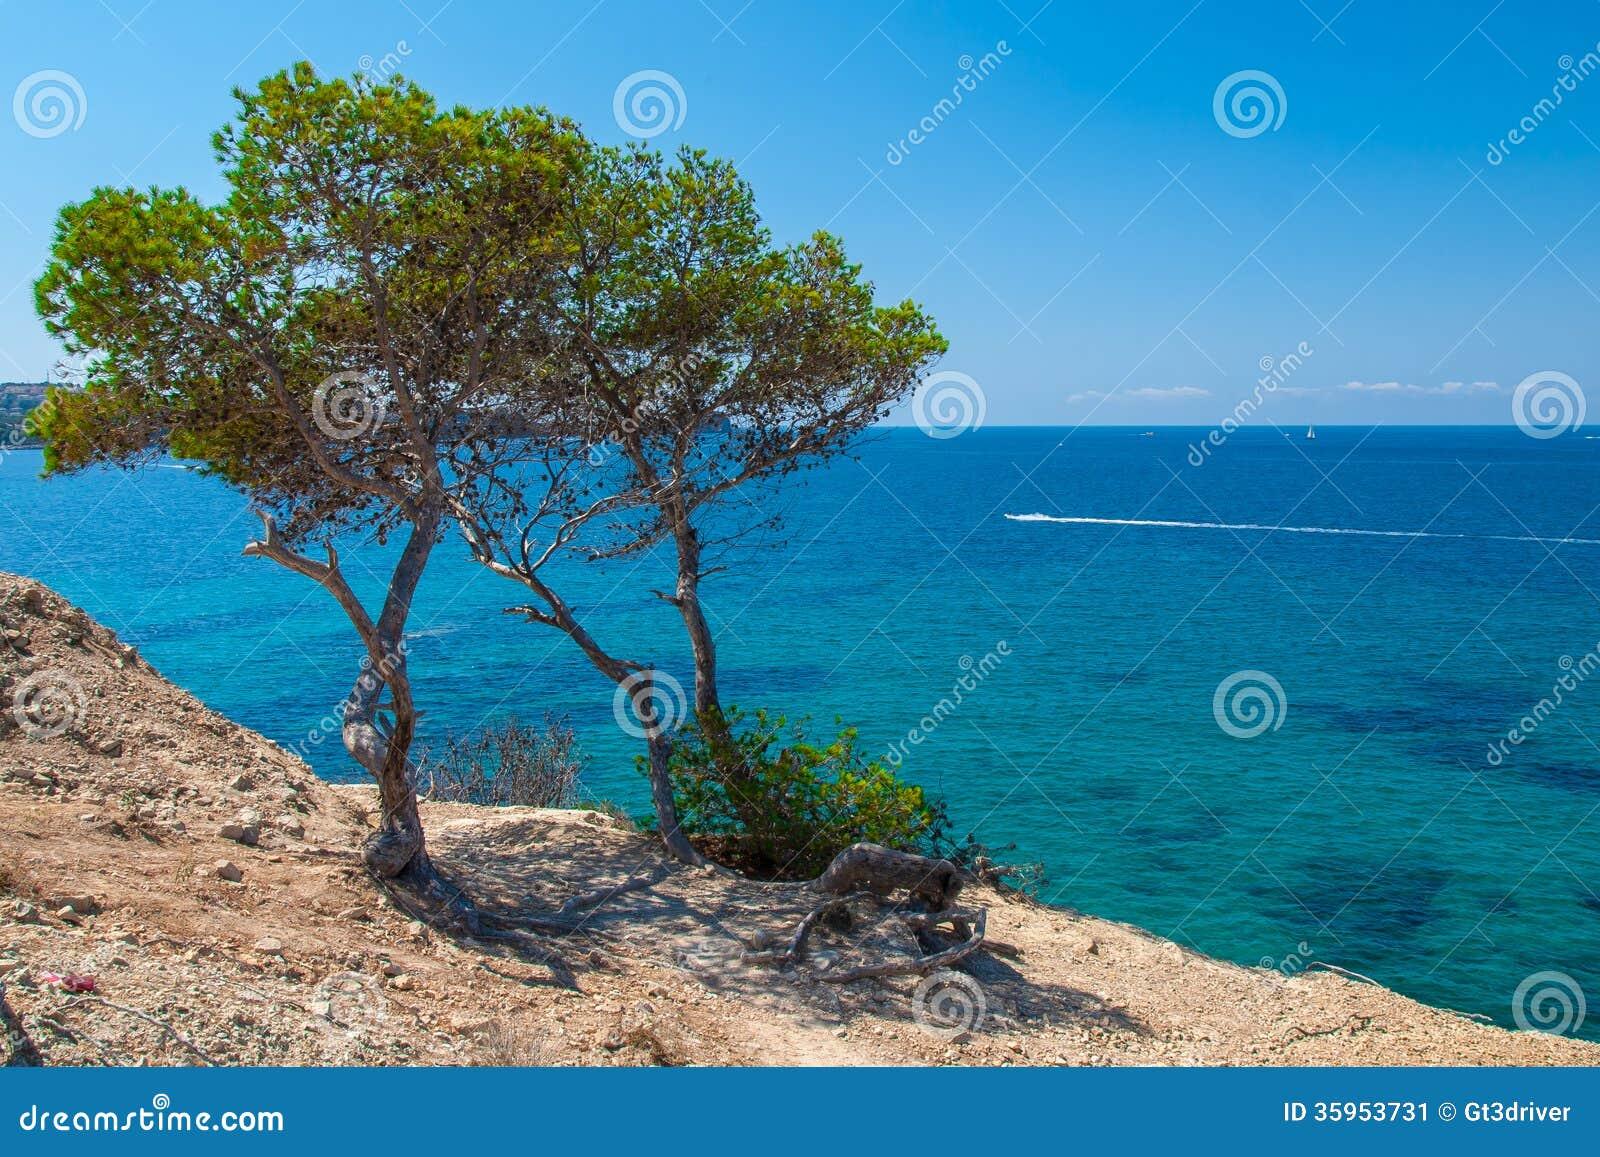 Vegetación subtropical que crece en la costa de Mallorca